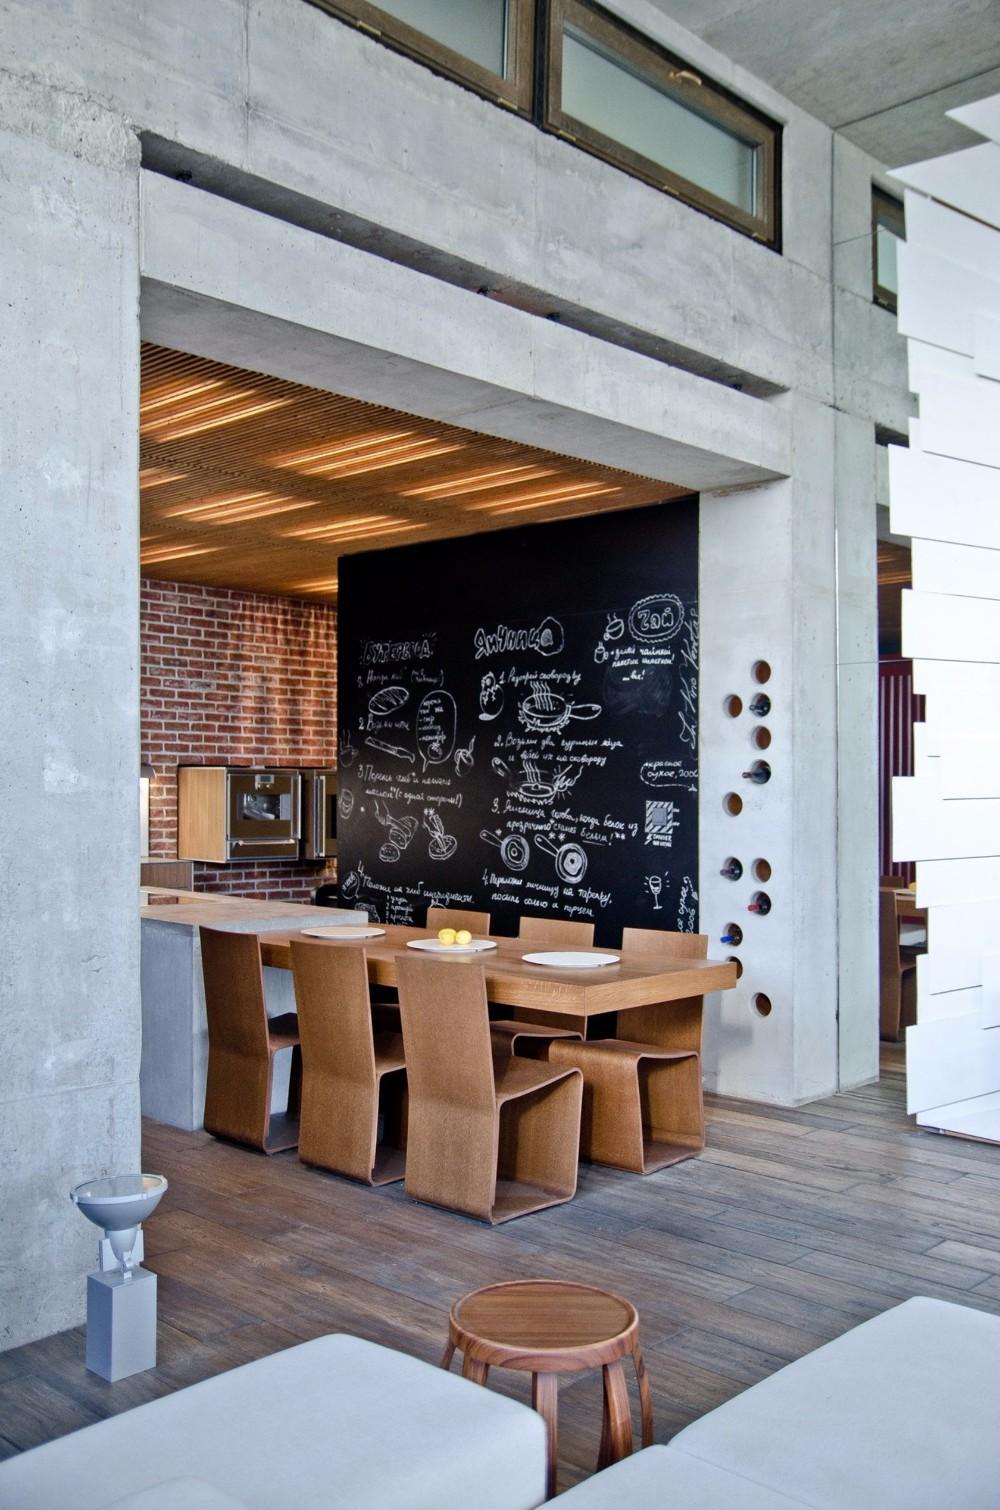 chalkboard 10 Chalkboard Dining Room Designs 5775f051